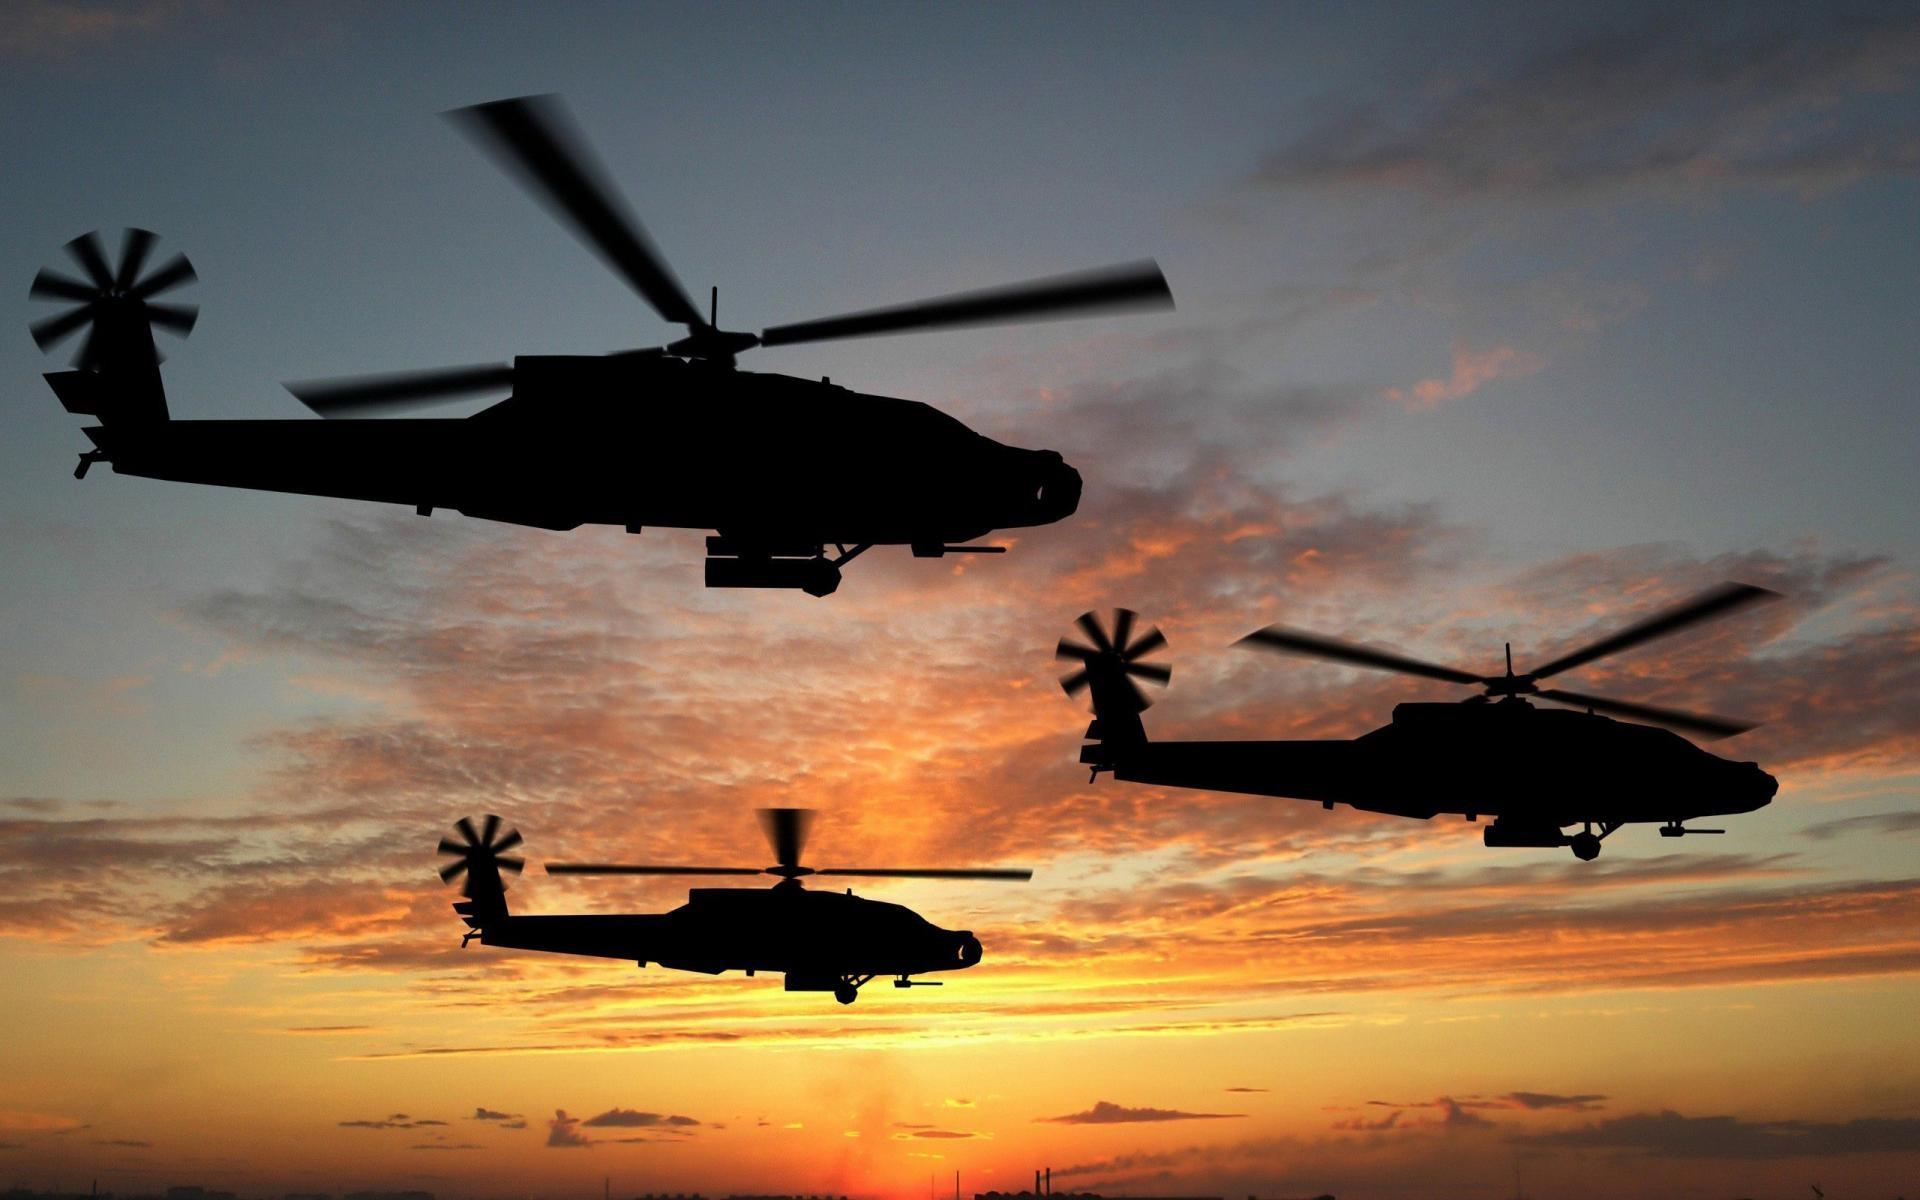 Helicópteros al atardecer - 1920x1200